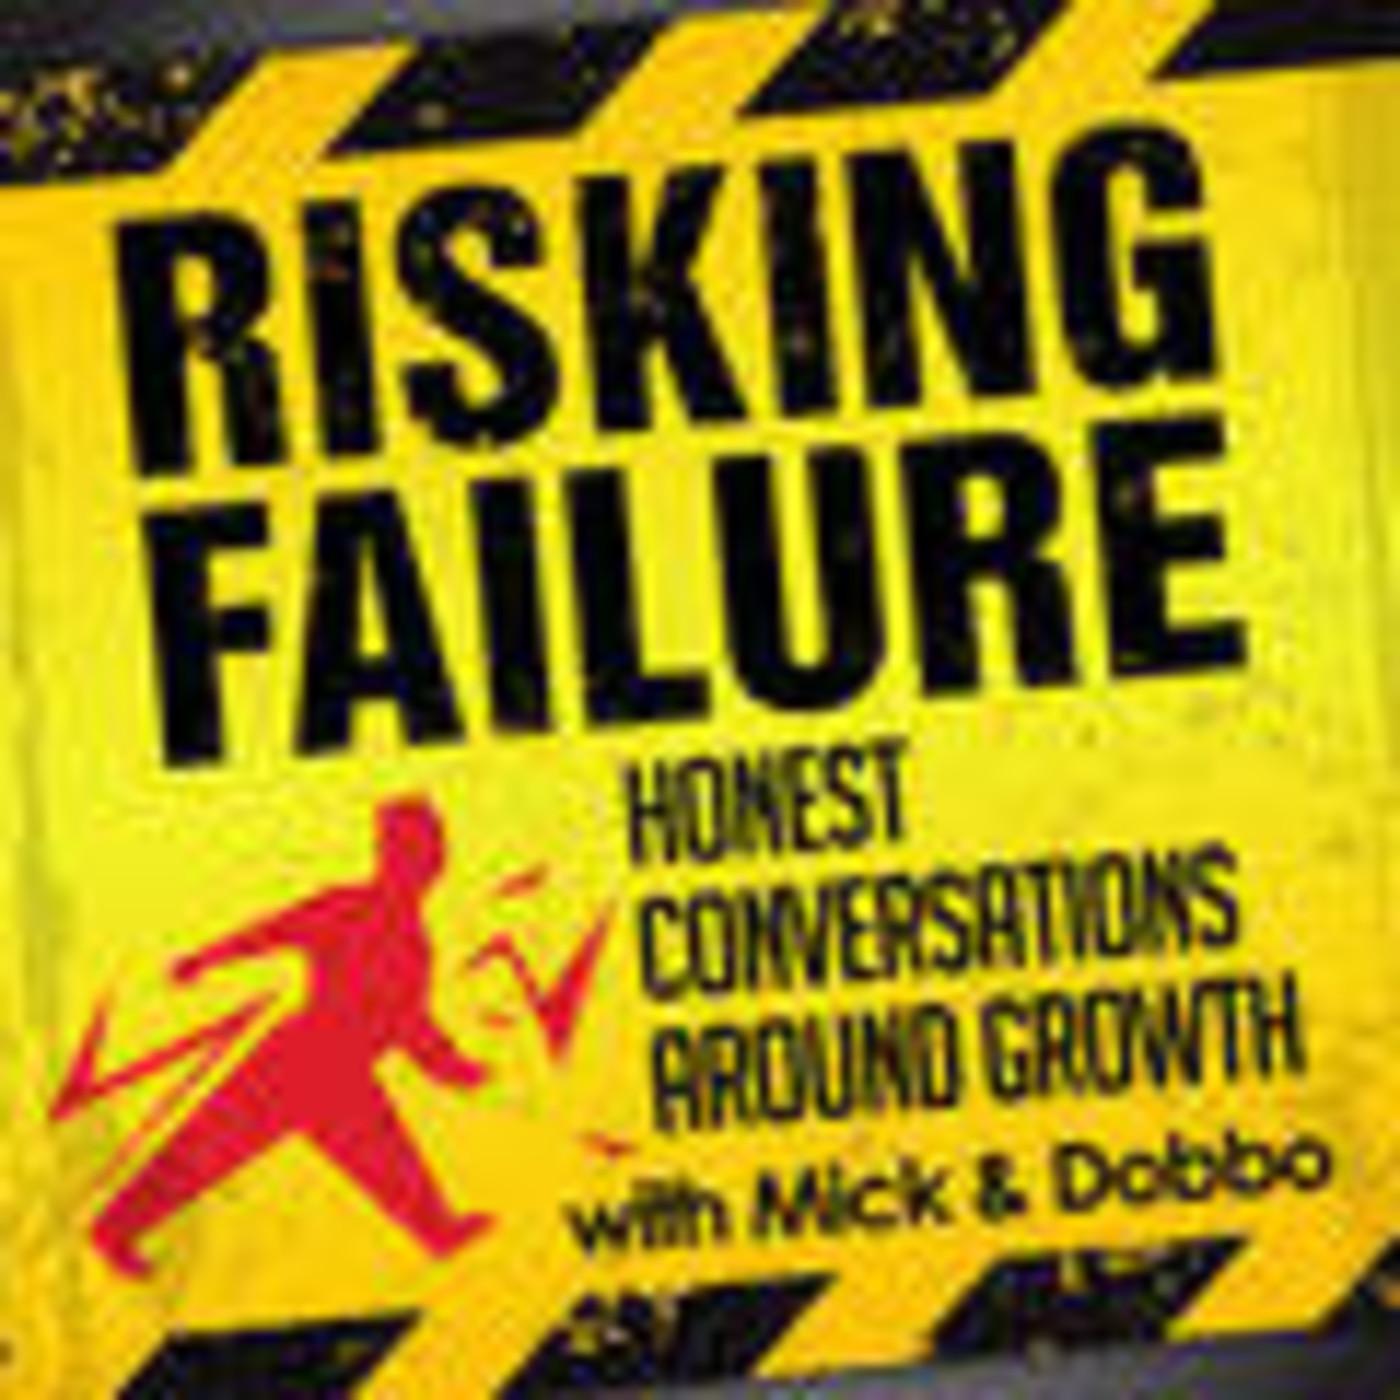 Mark Dobson & Mick Dunn: P